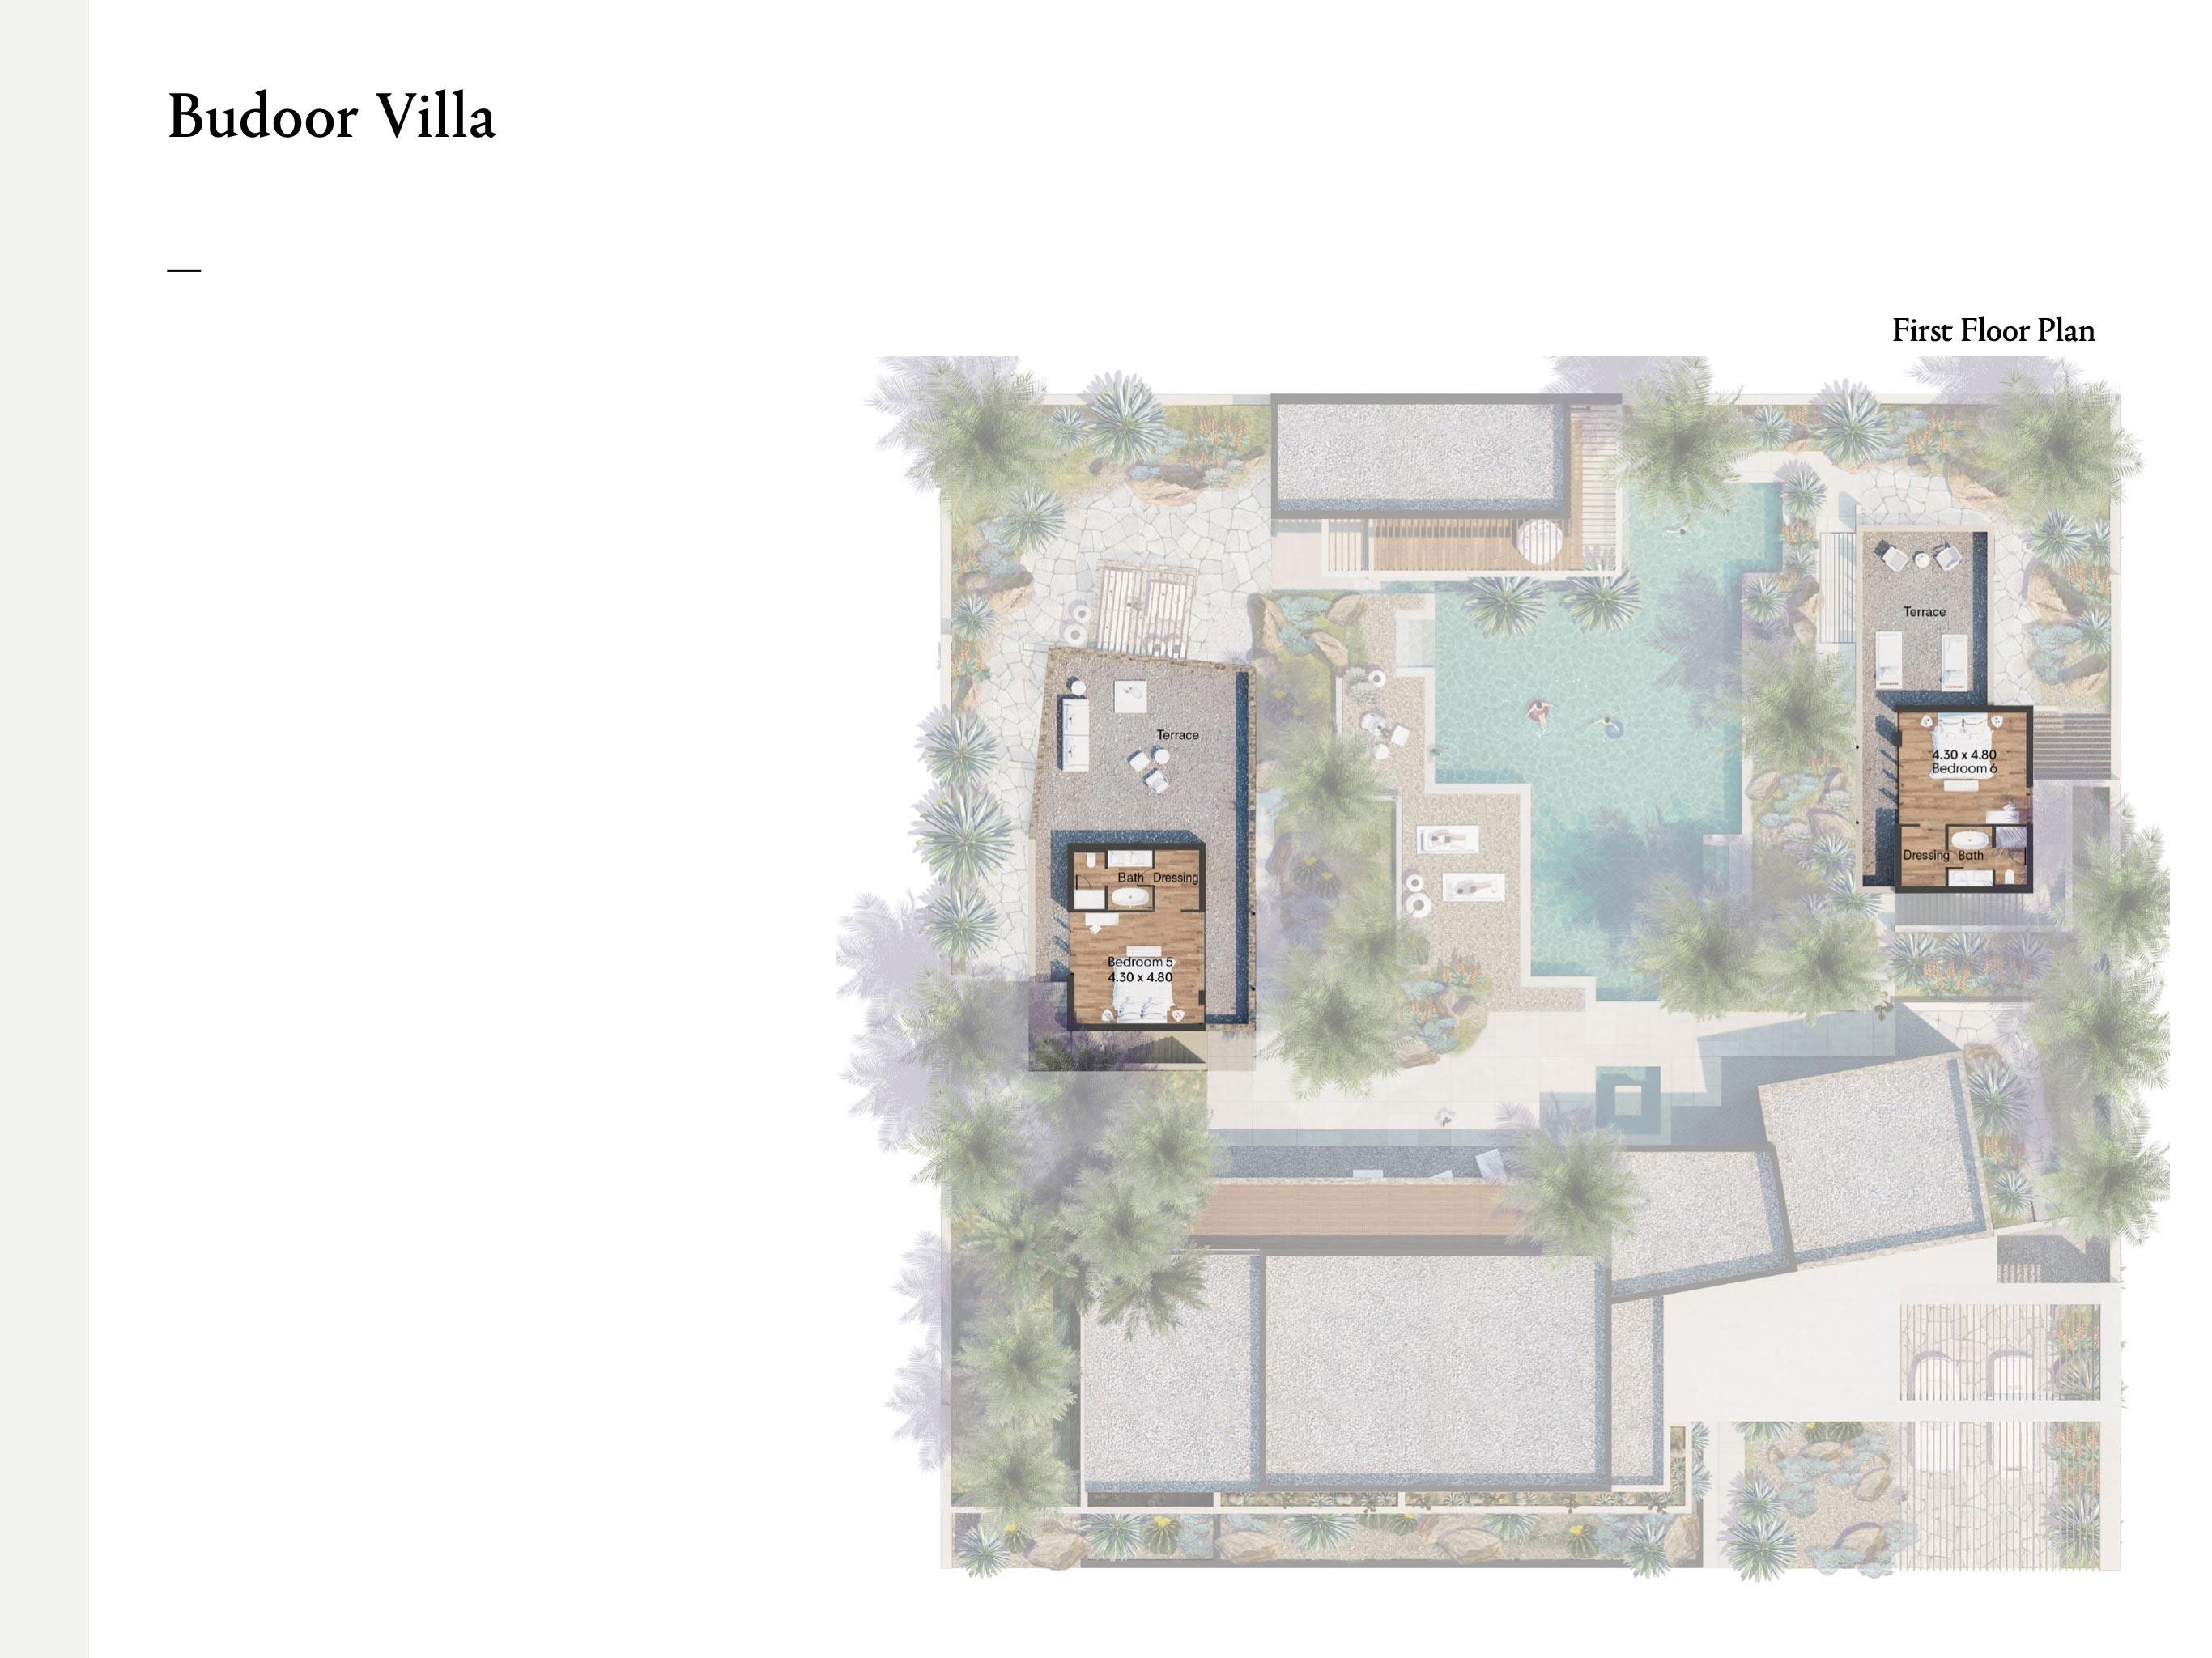 Budoor Villa - 4 Bedroom with a size area of 419 sqm